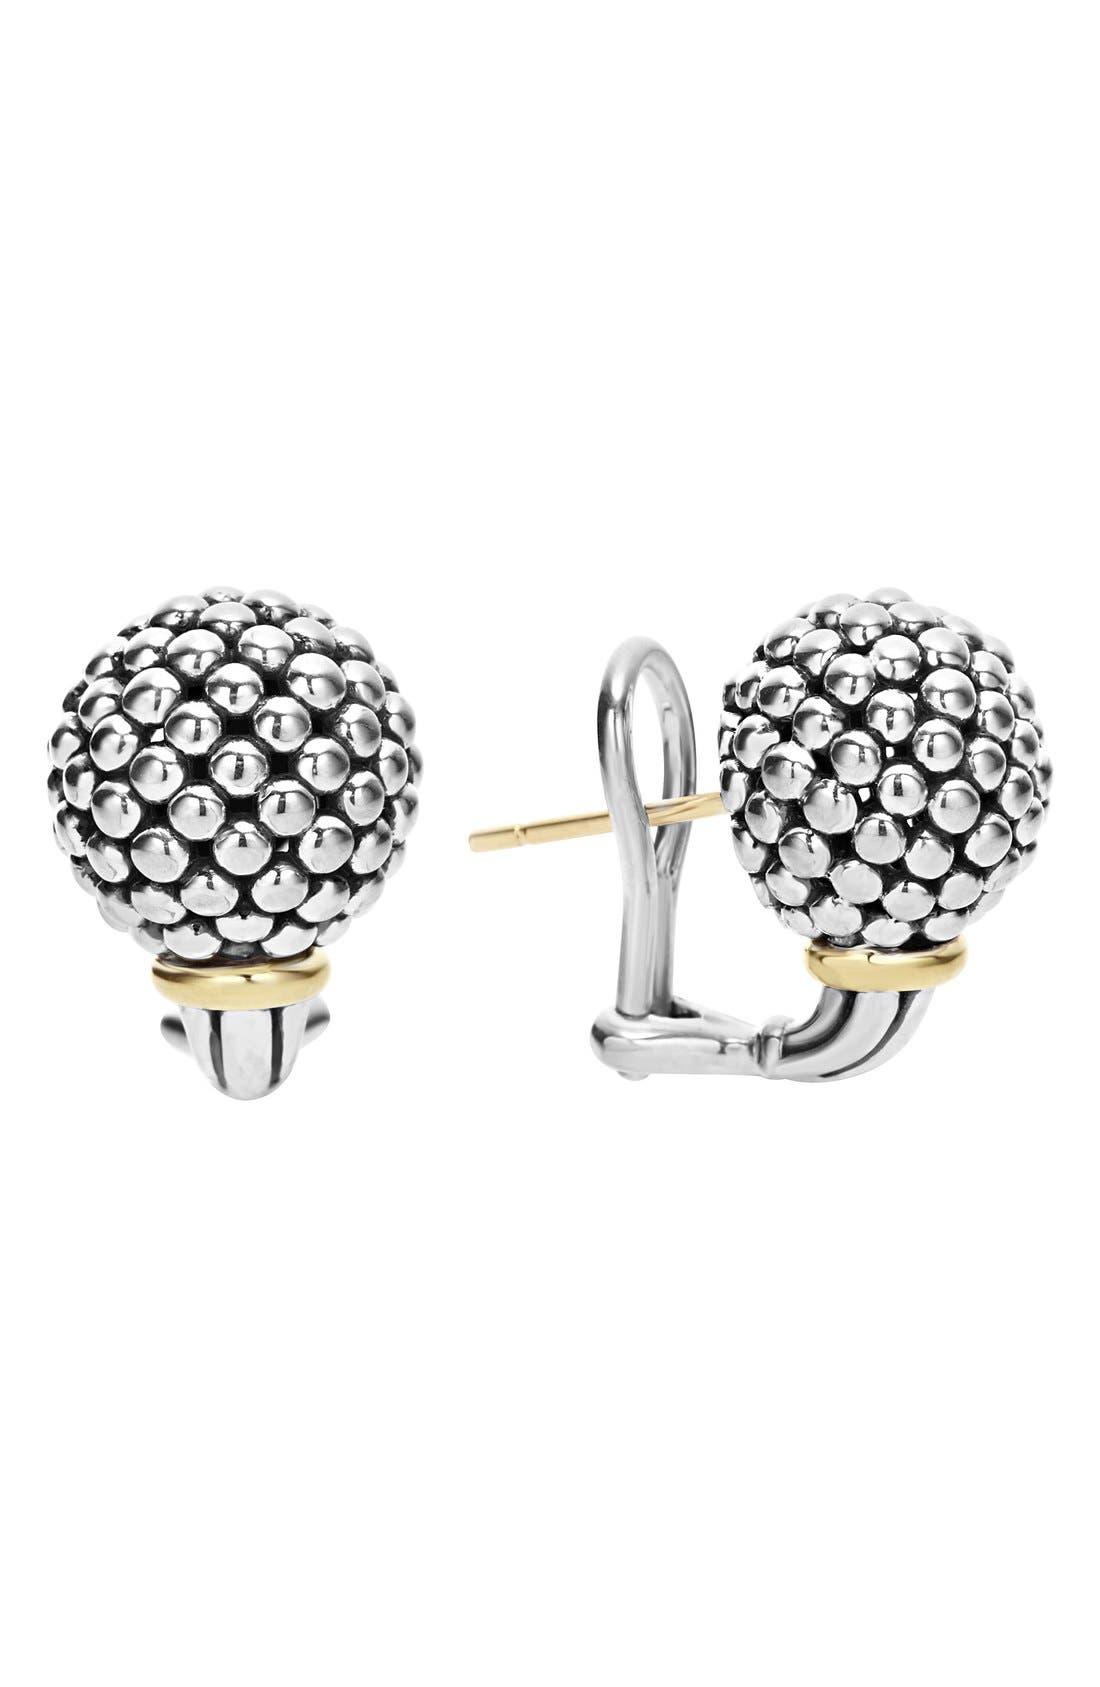 Alternate Image 1 Selected - LAGOS 'Caviar Forever' Stud Earrings